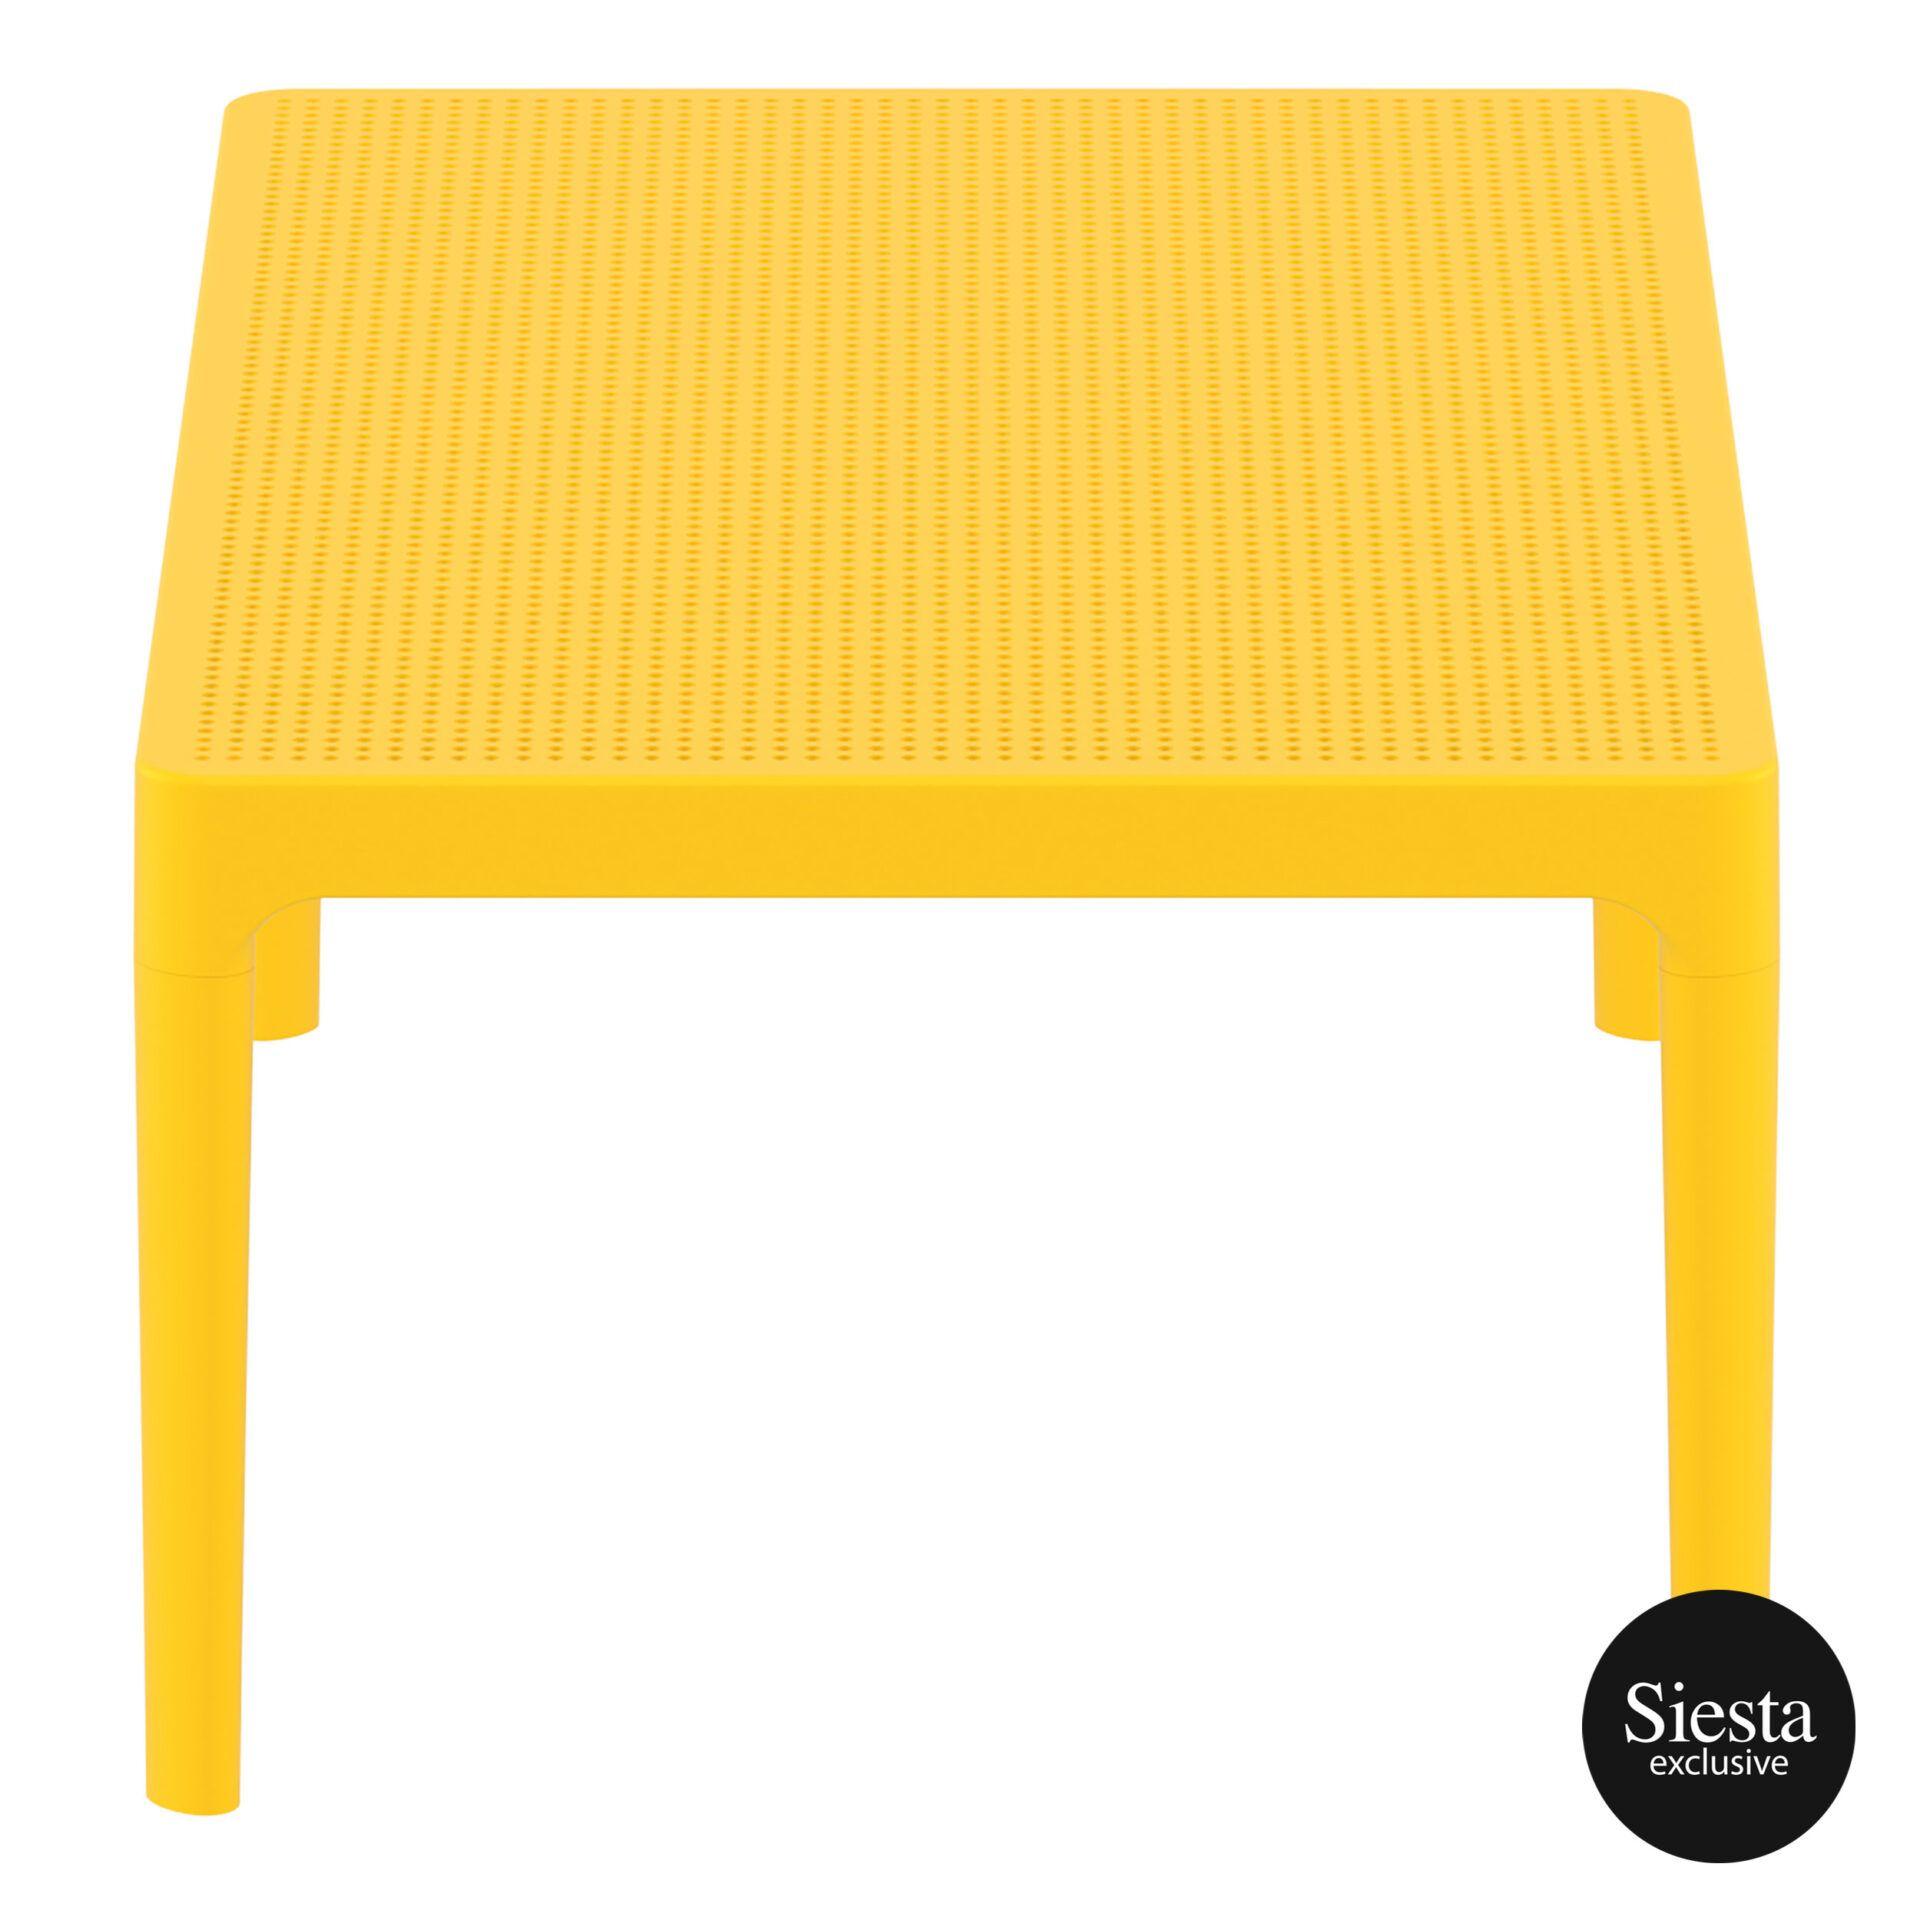 polypropylene outdoor sky lounge coffee table yellow short edge 1